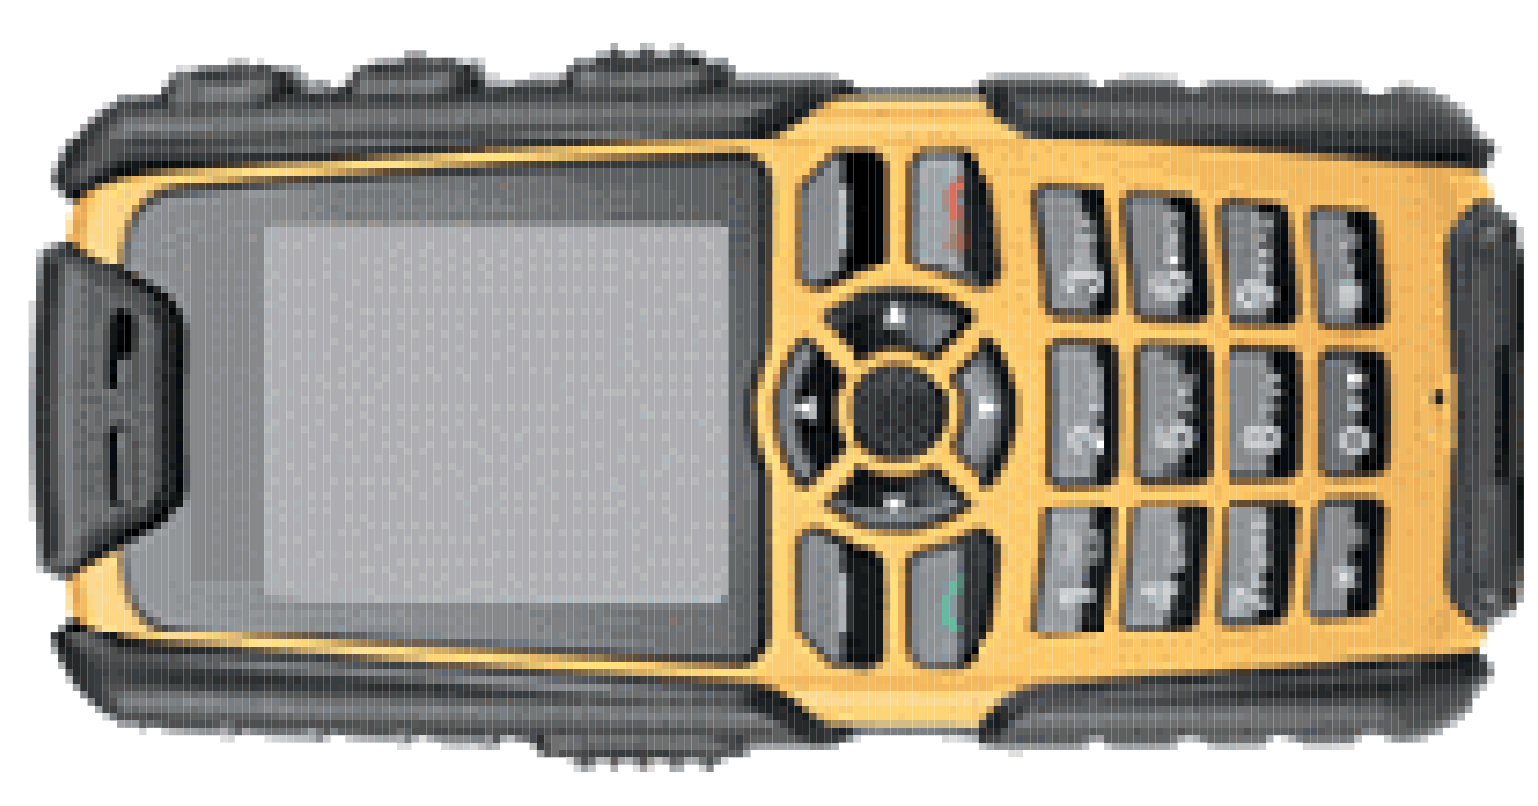 Mobile Phone XP3.10 Zone 1-21 Zone 2-22